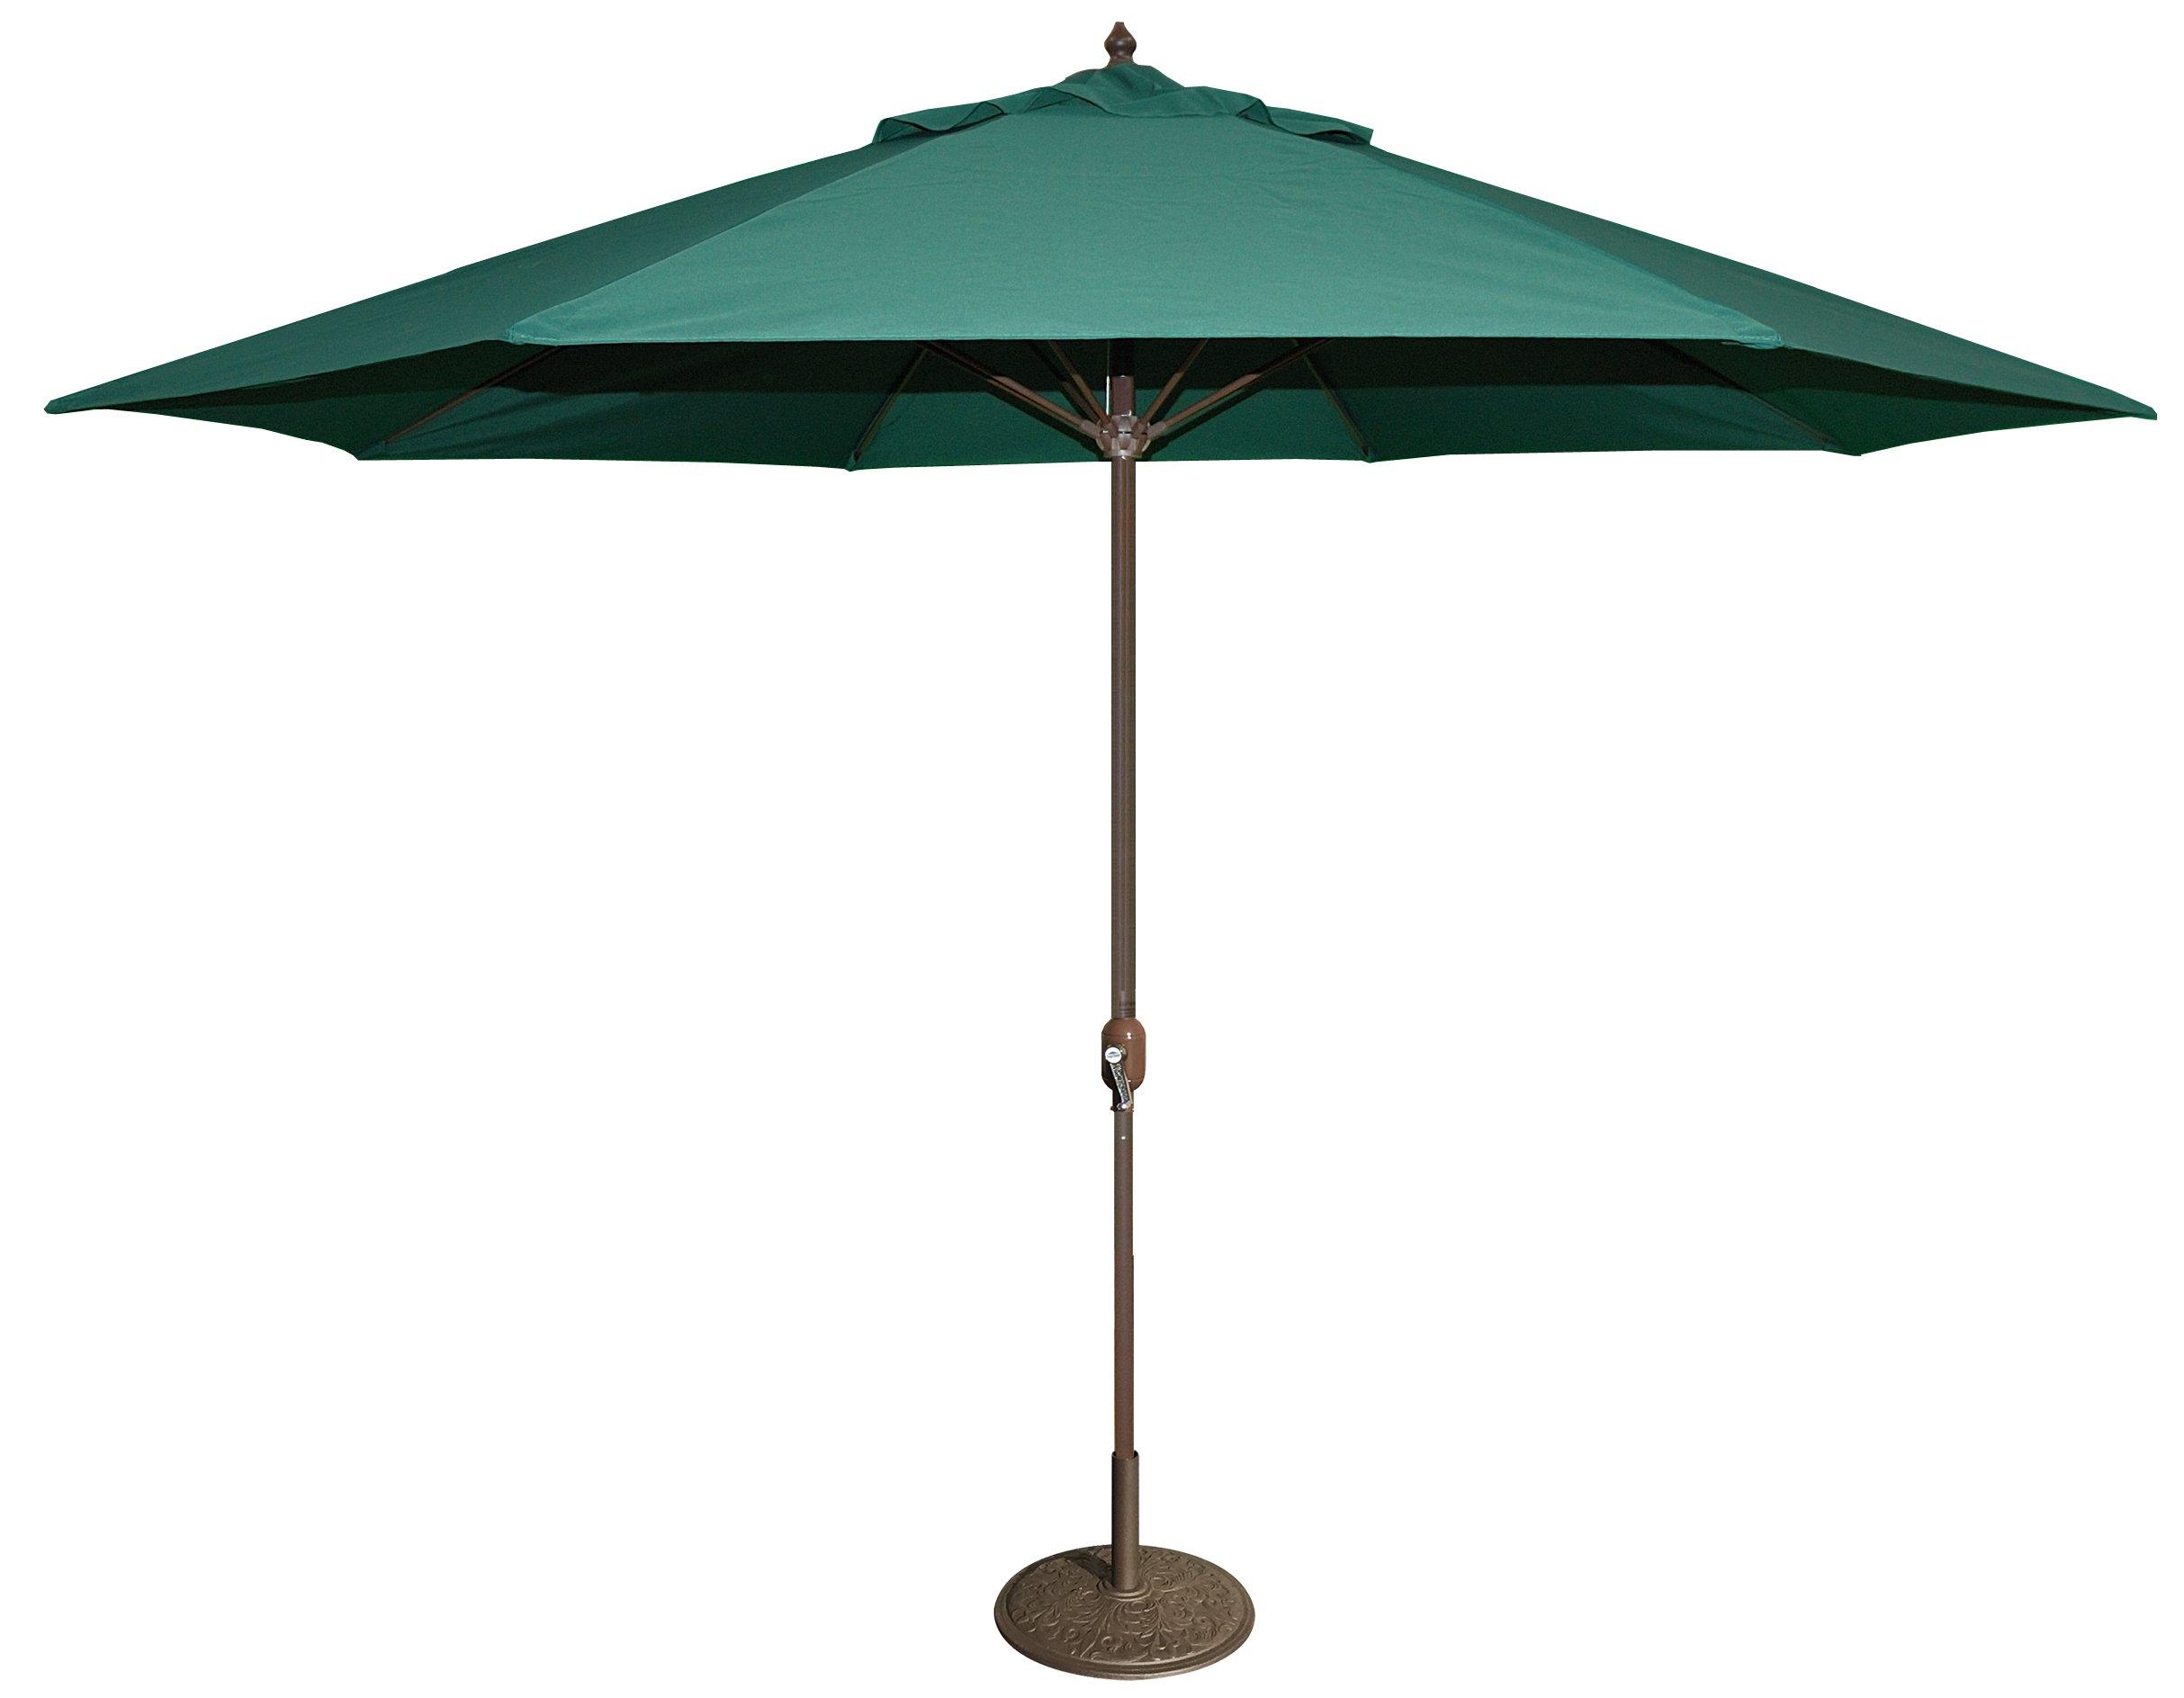 Tropishade 11' Umbrella with Premium Green Olefin Cover